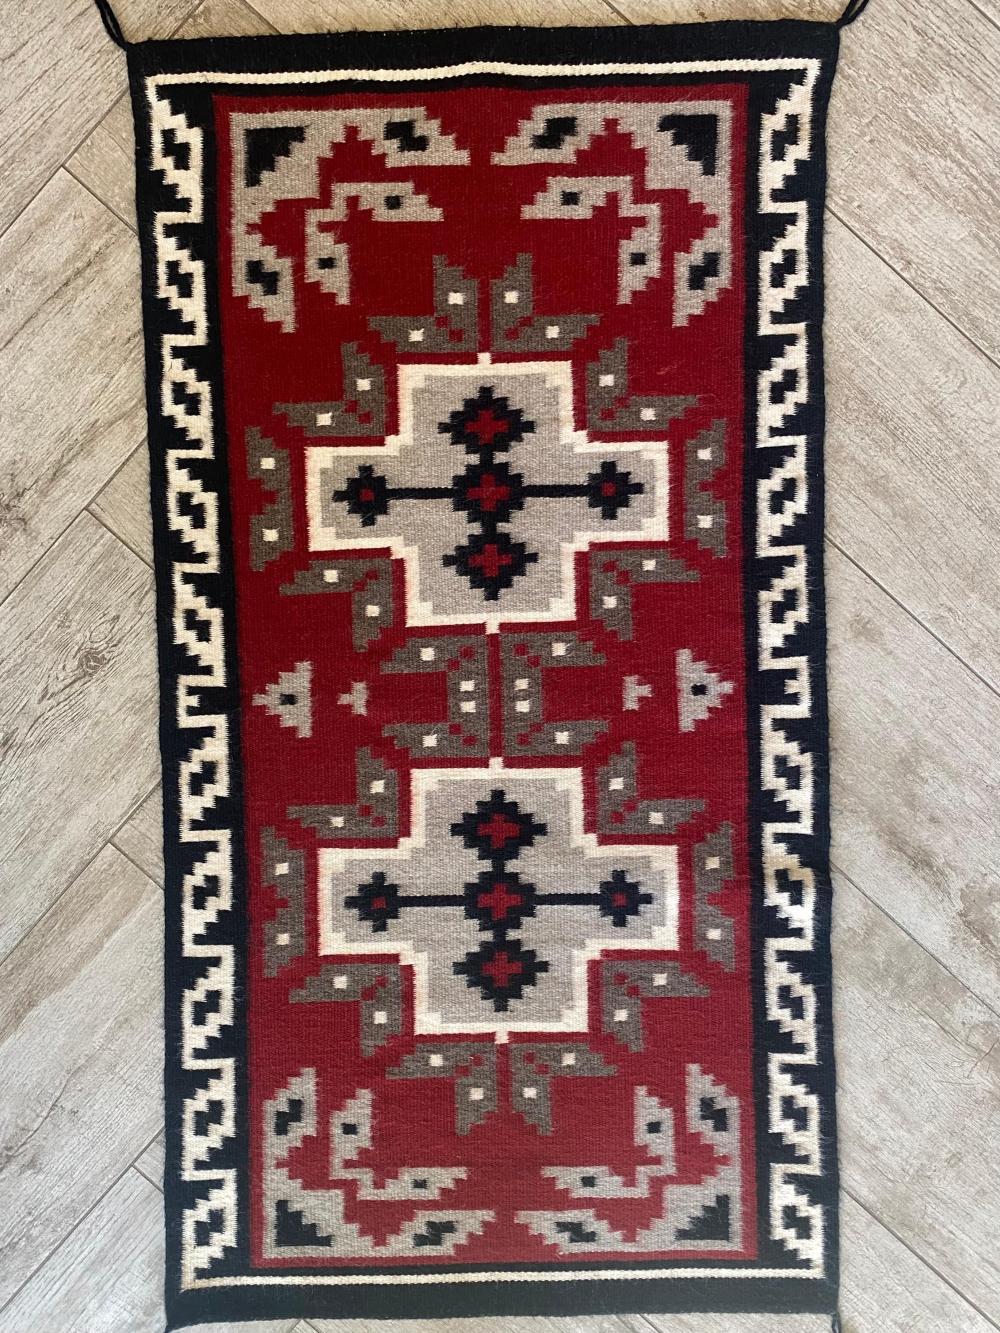 Native American Red, White & Black Rug